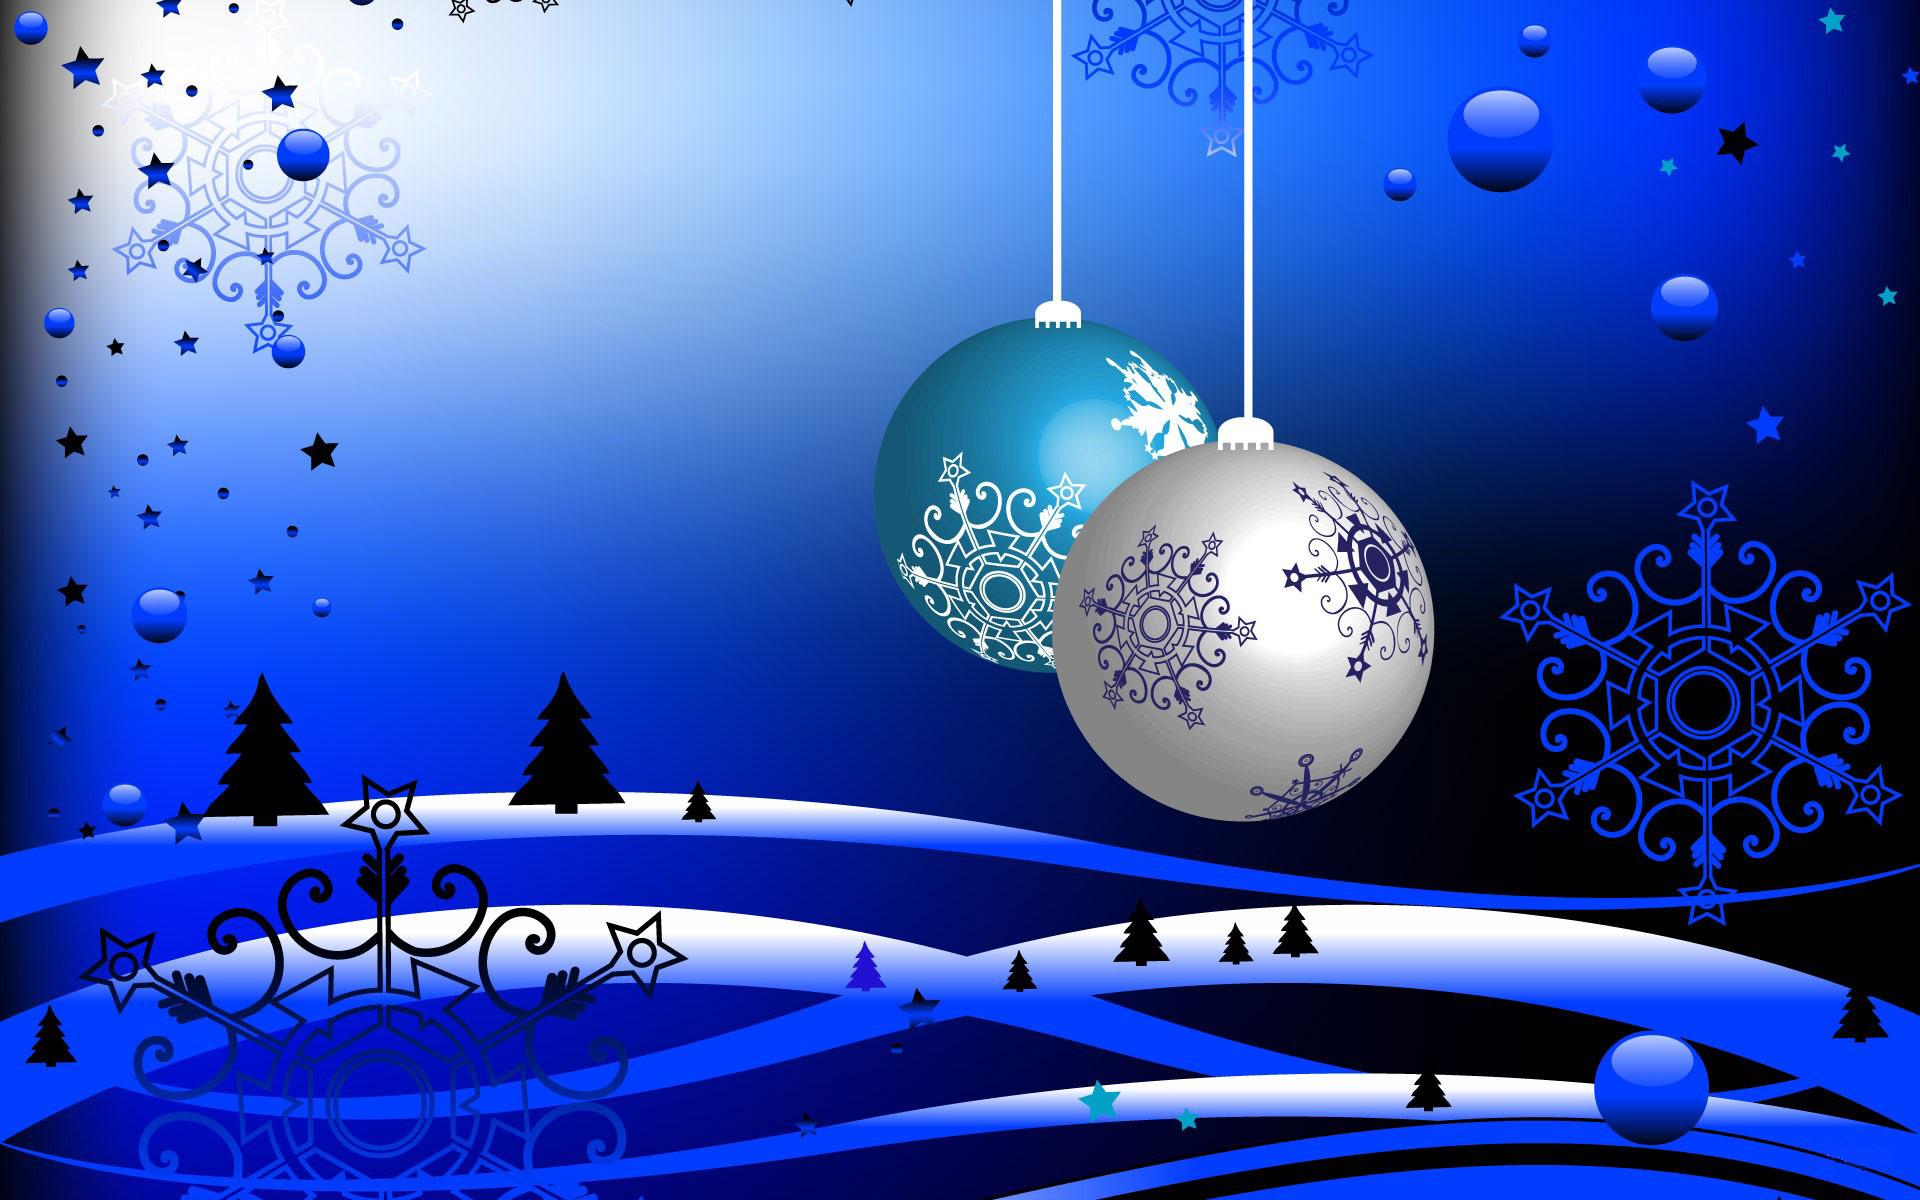 3d Christmas Wallpaper Full Desktop Backgrounds 1920x1200